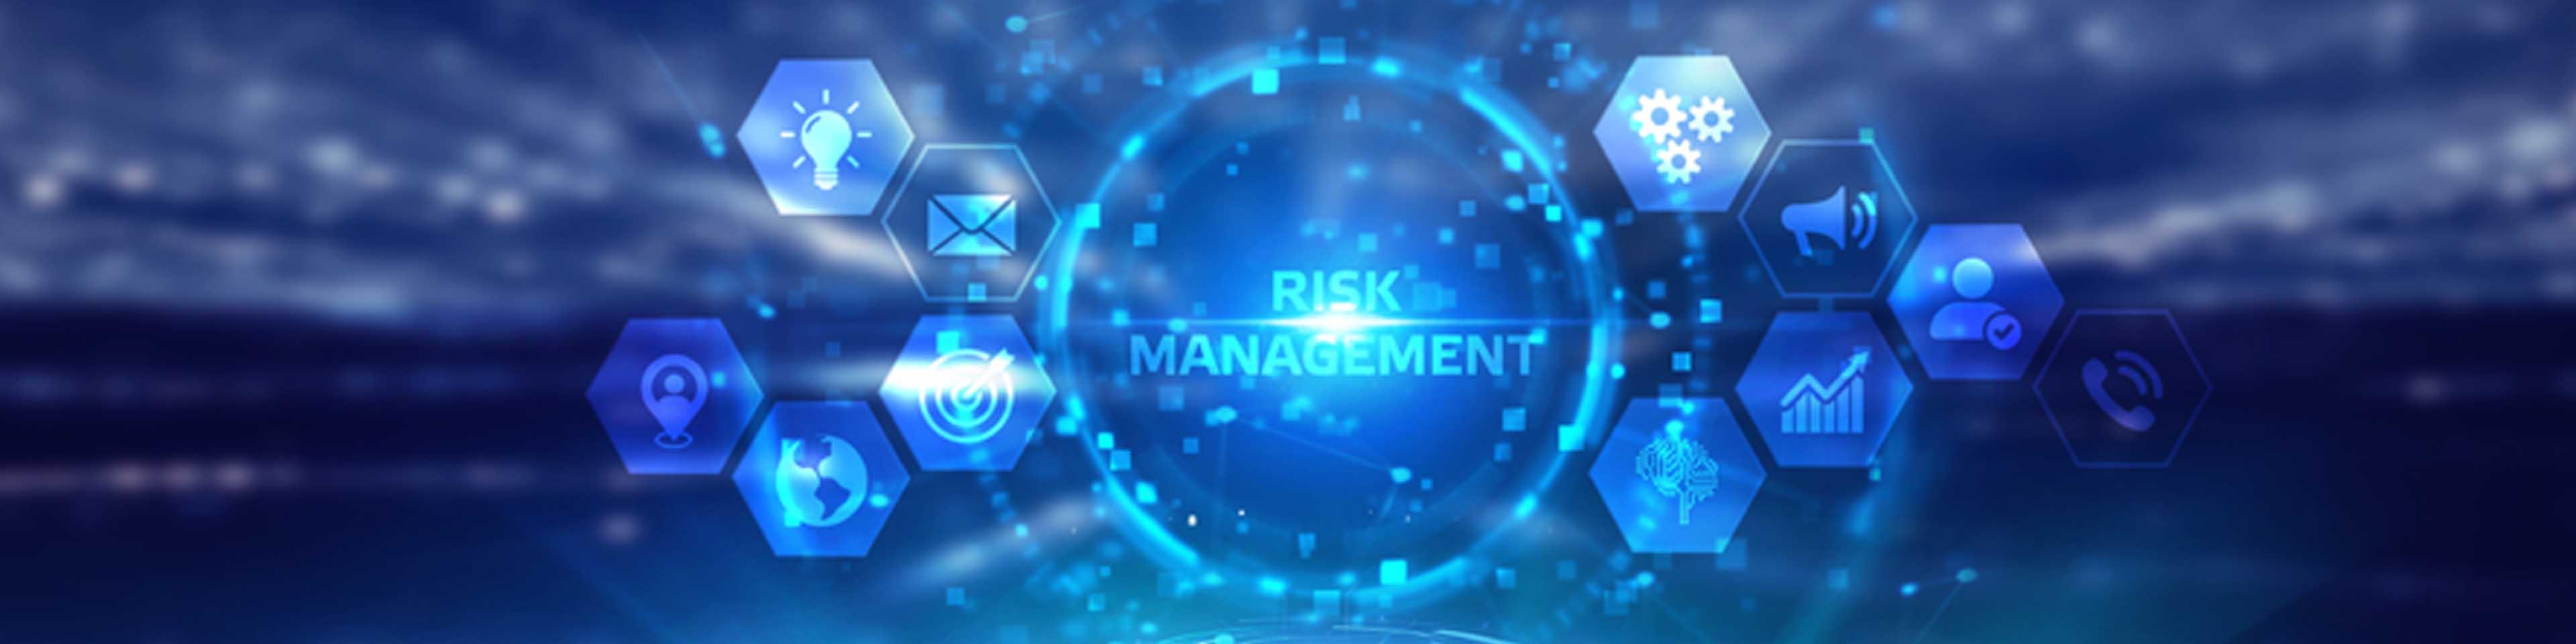 Five keys to law firm risk mitigation